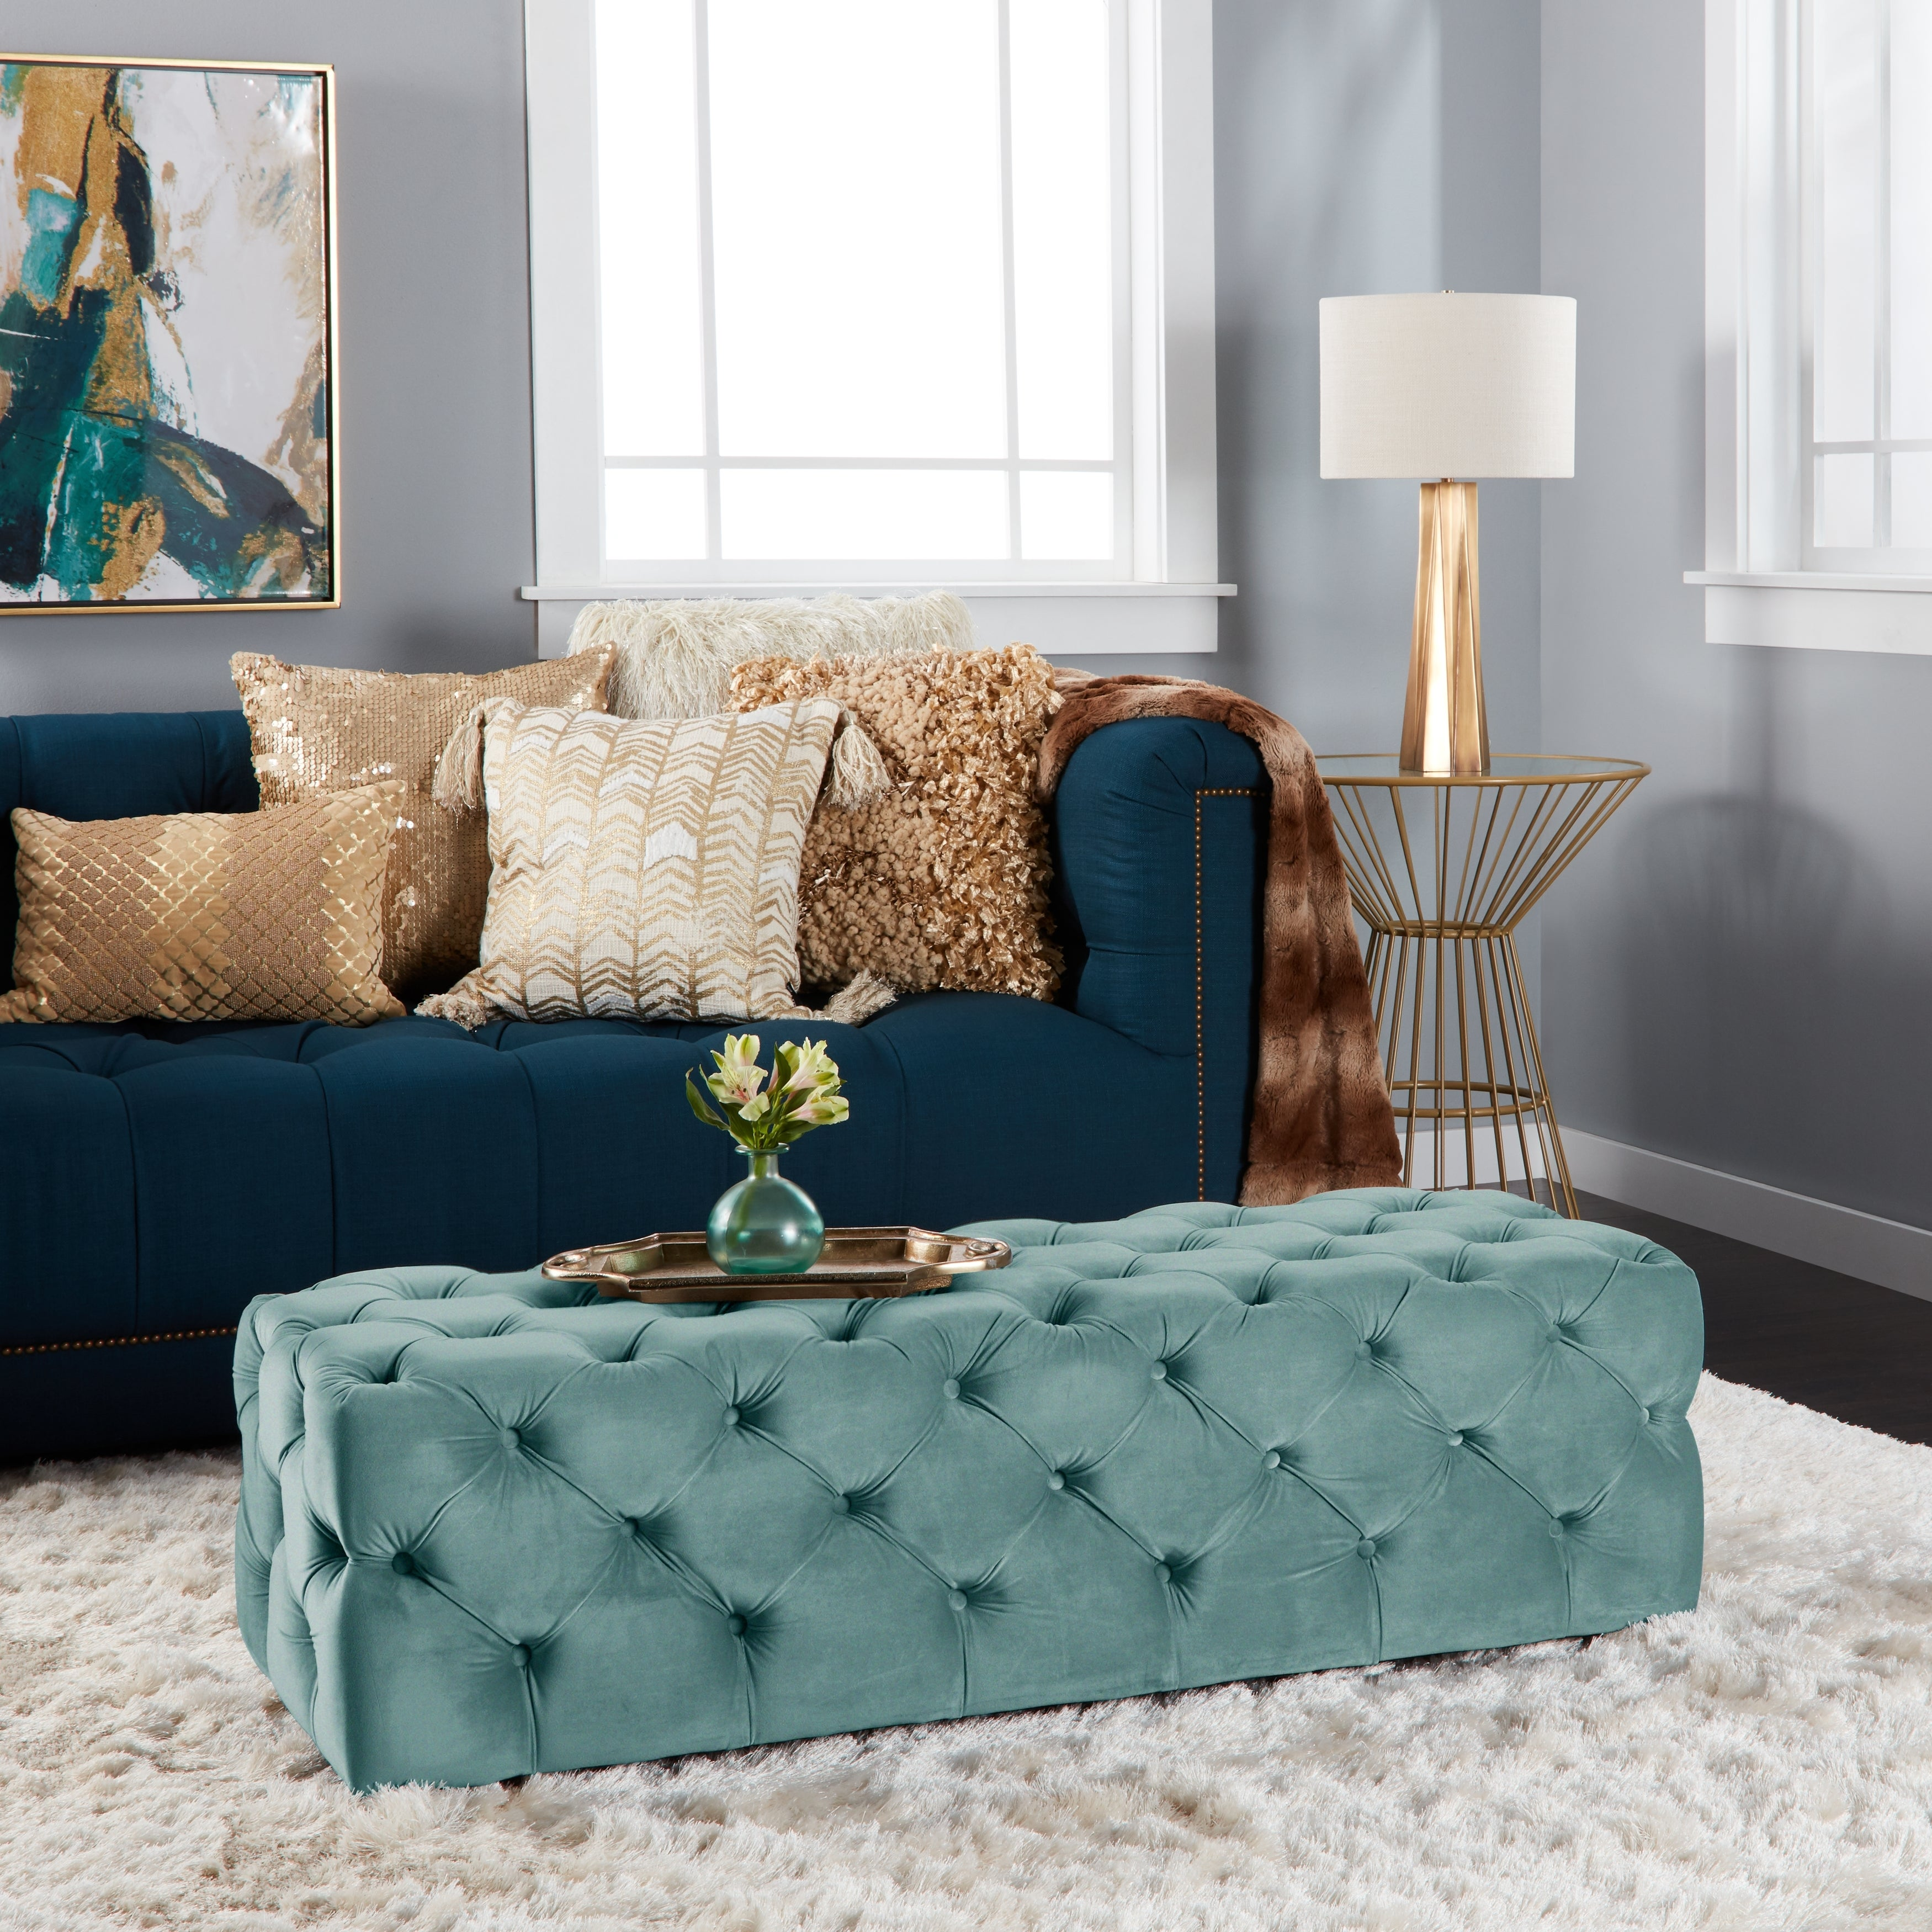 Phenomenal Piper Tufted Velvet Fabric Rectangle Ottoman Bench By Christopher Knight Home Inzonedesignstudio Interior Chair Design Inzonedesignstudiocom